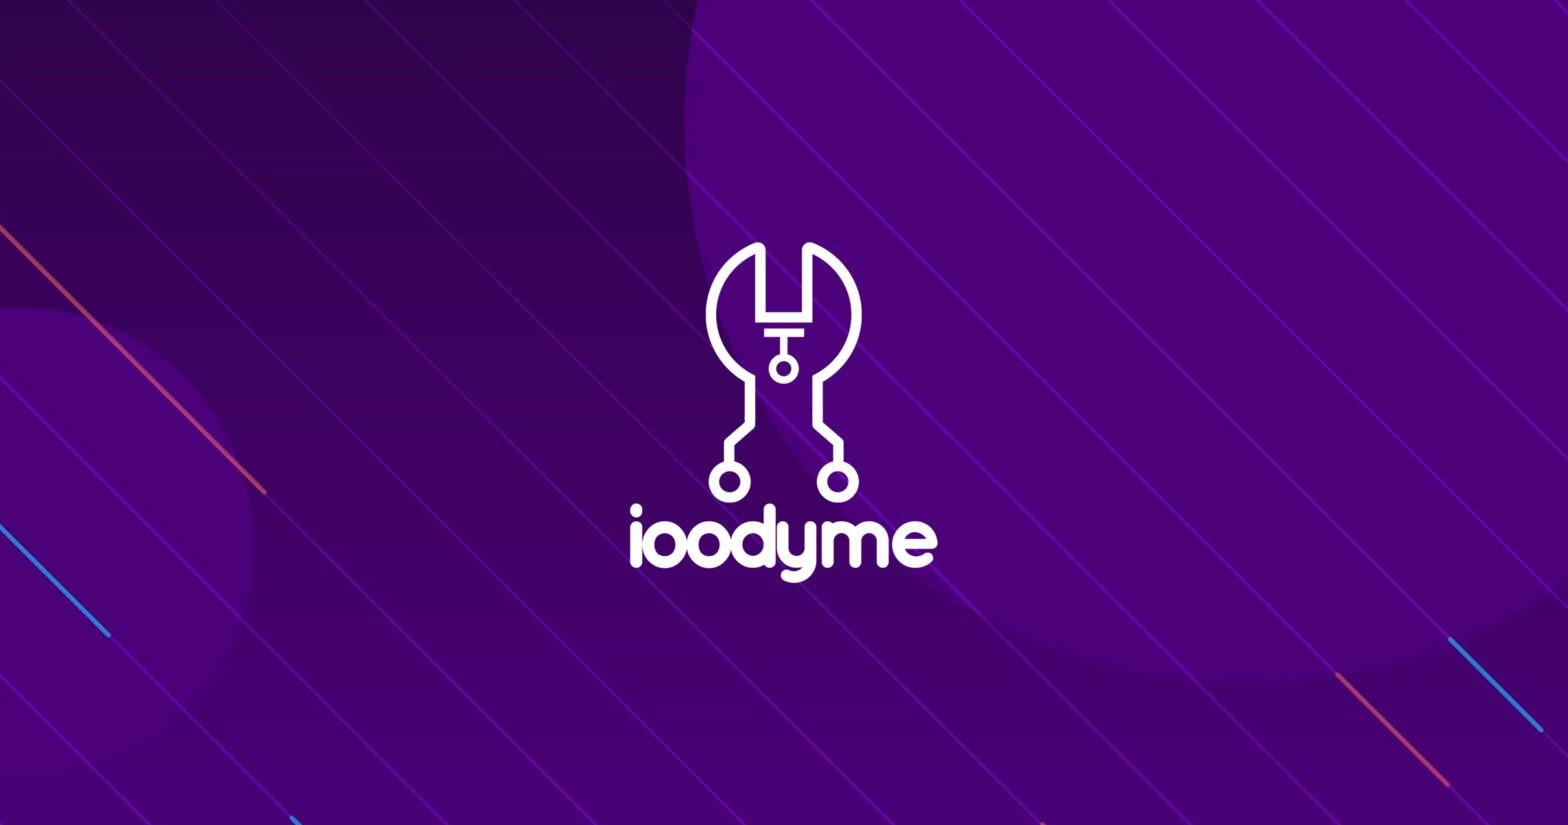 Fond ioodyme